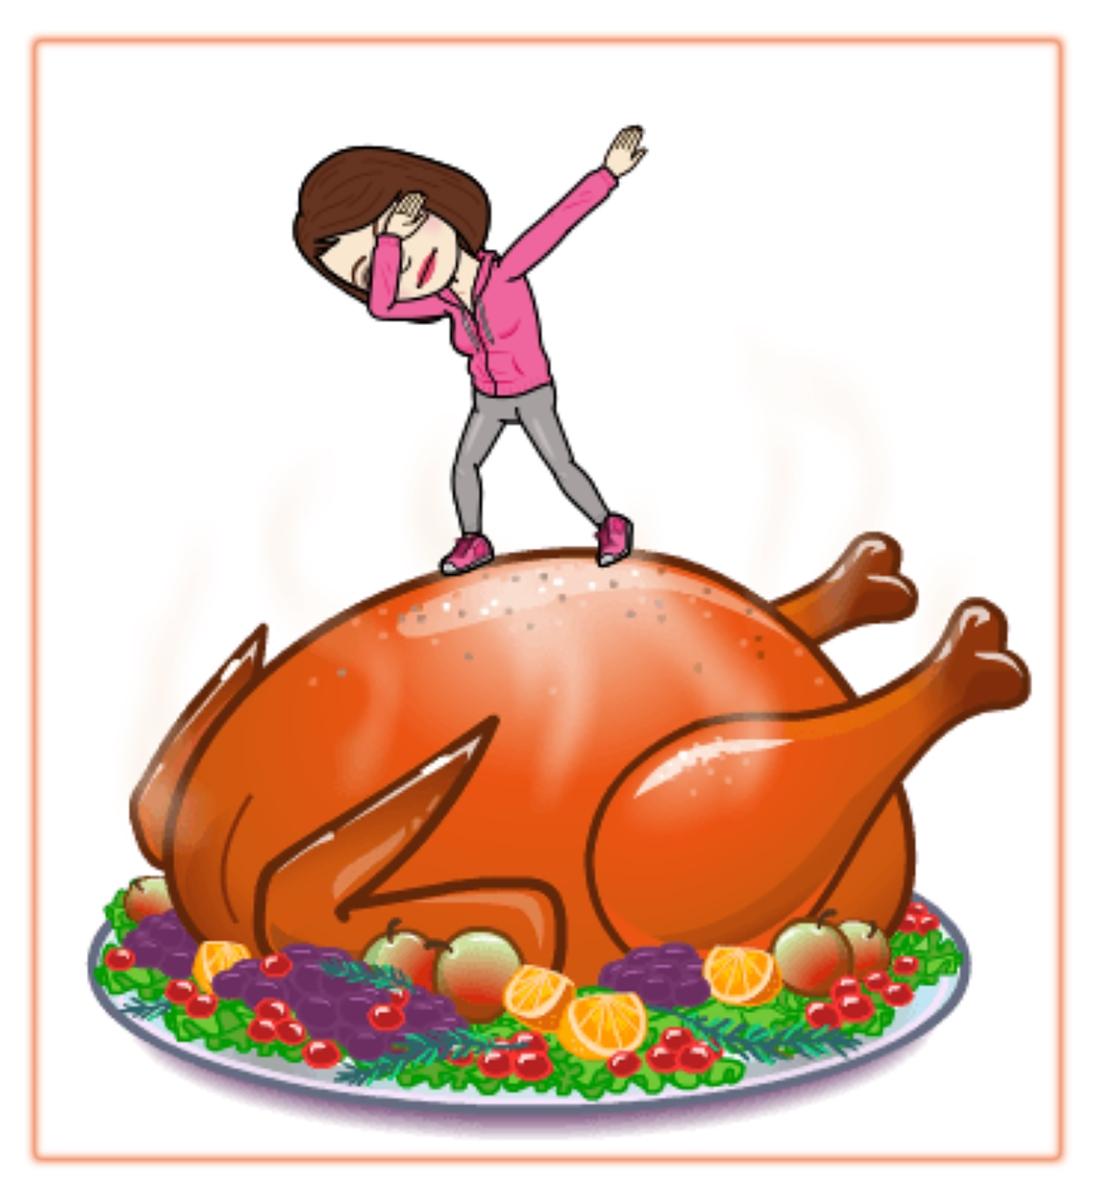 Pam on turkeyIMG_5095